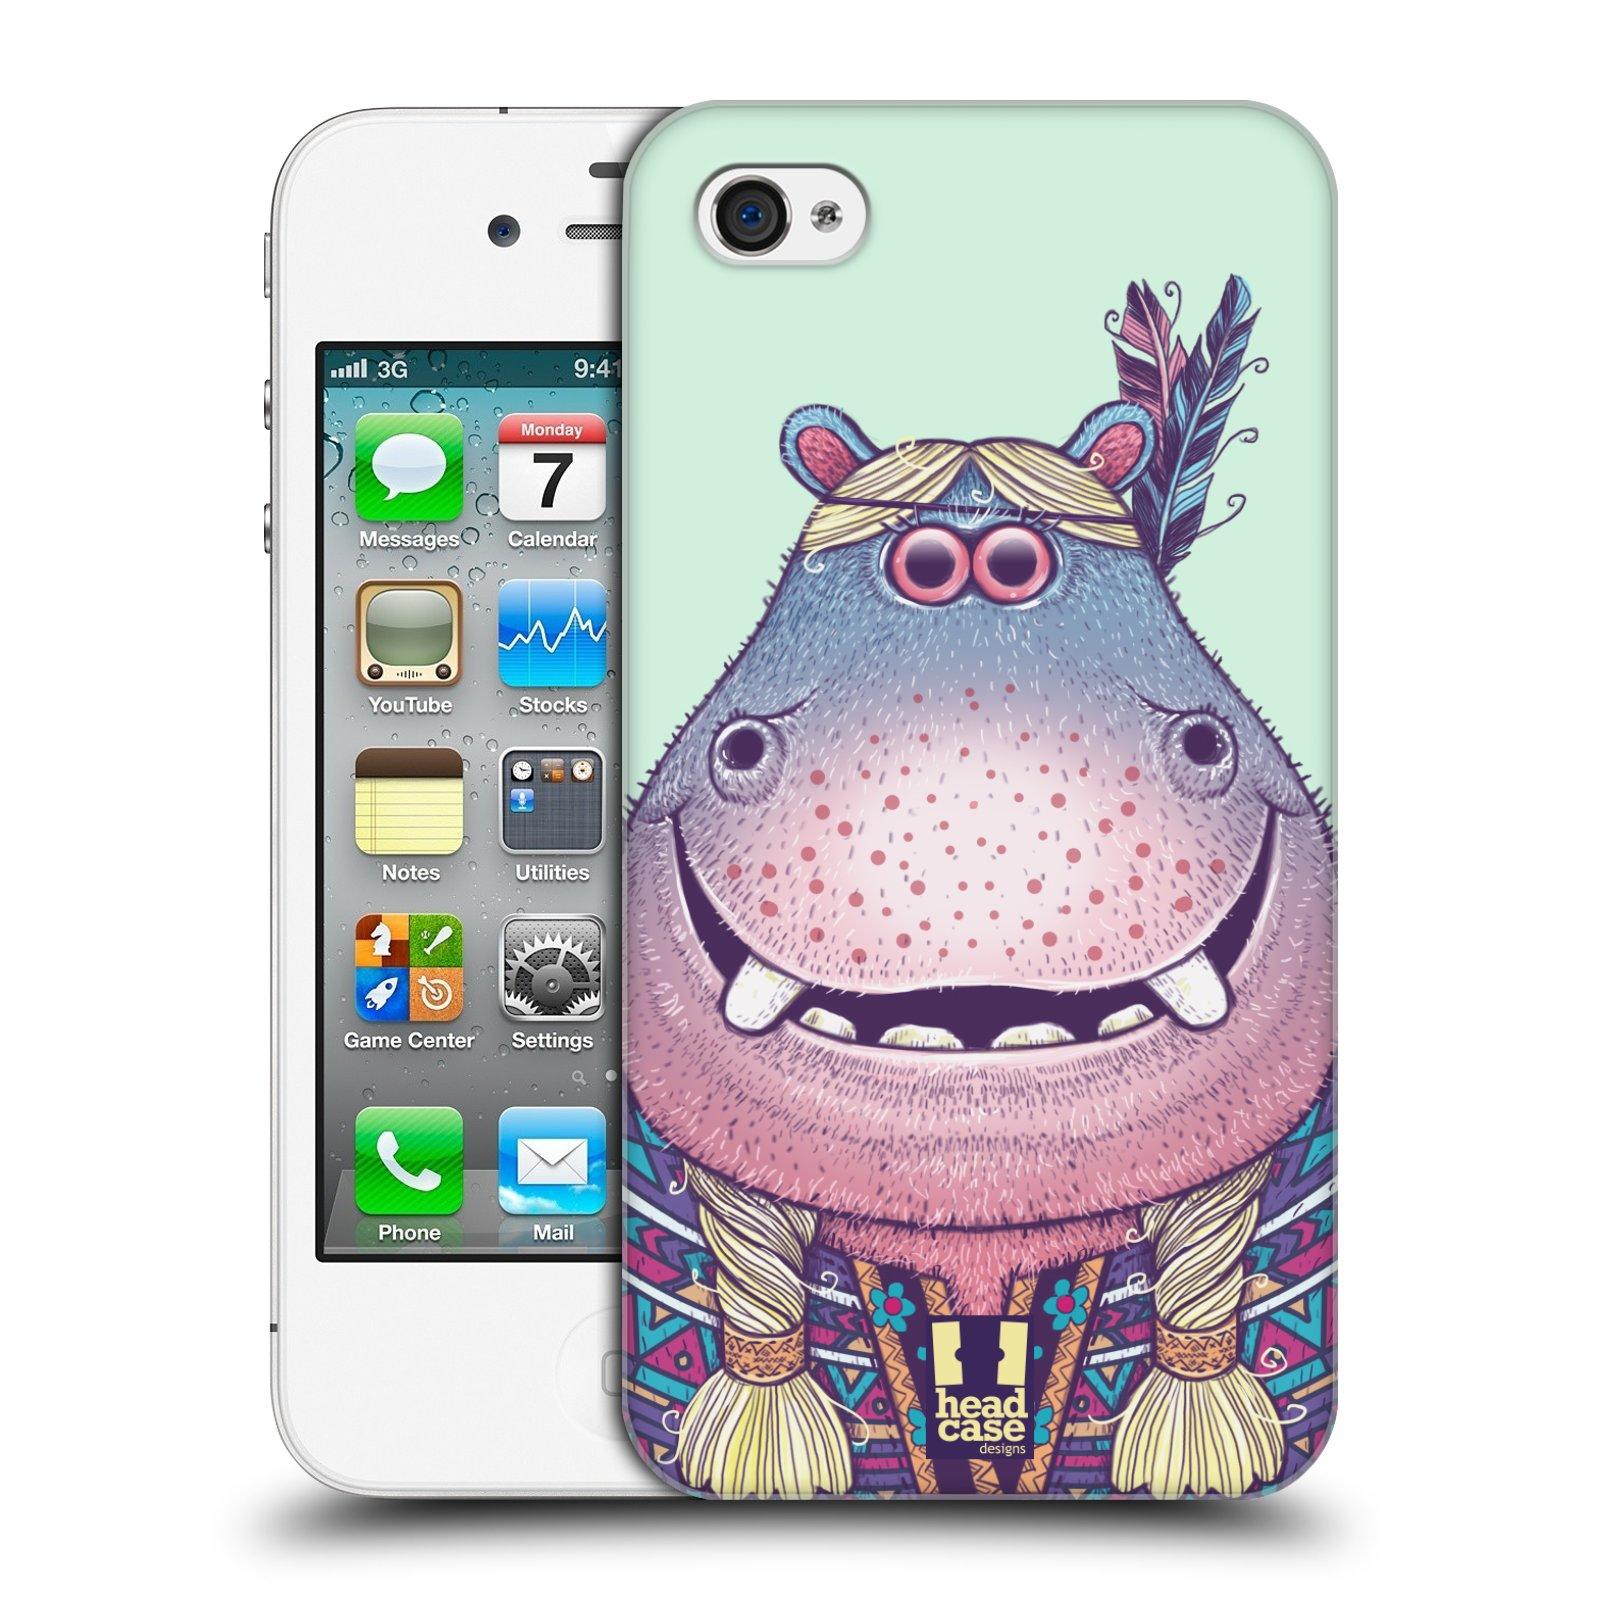 HEAD CASE plastový obal na mobil Apple Iphone 4/4S vzor Kreslená zvířátka hroch